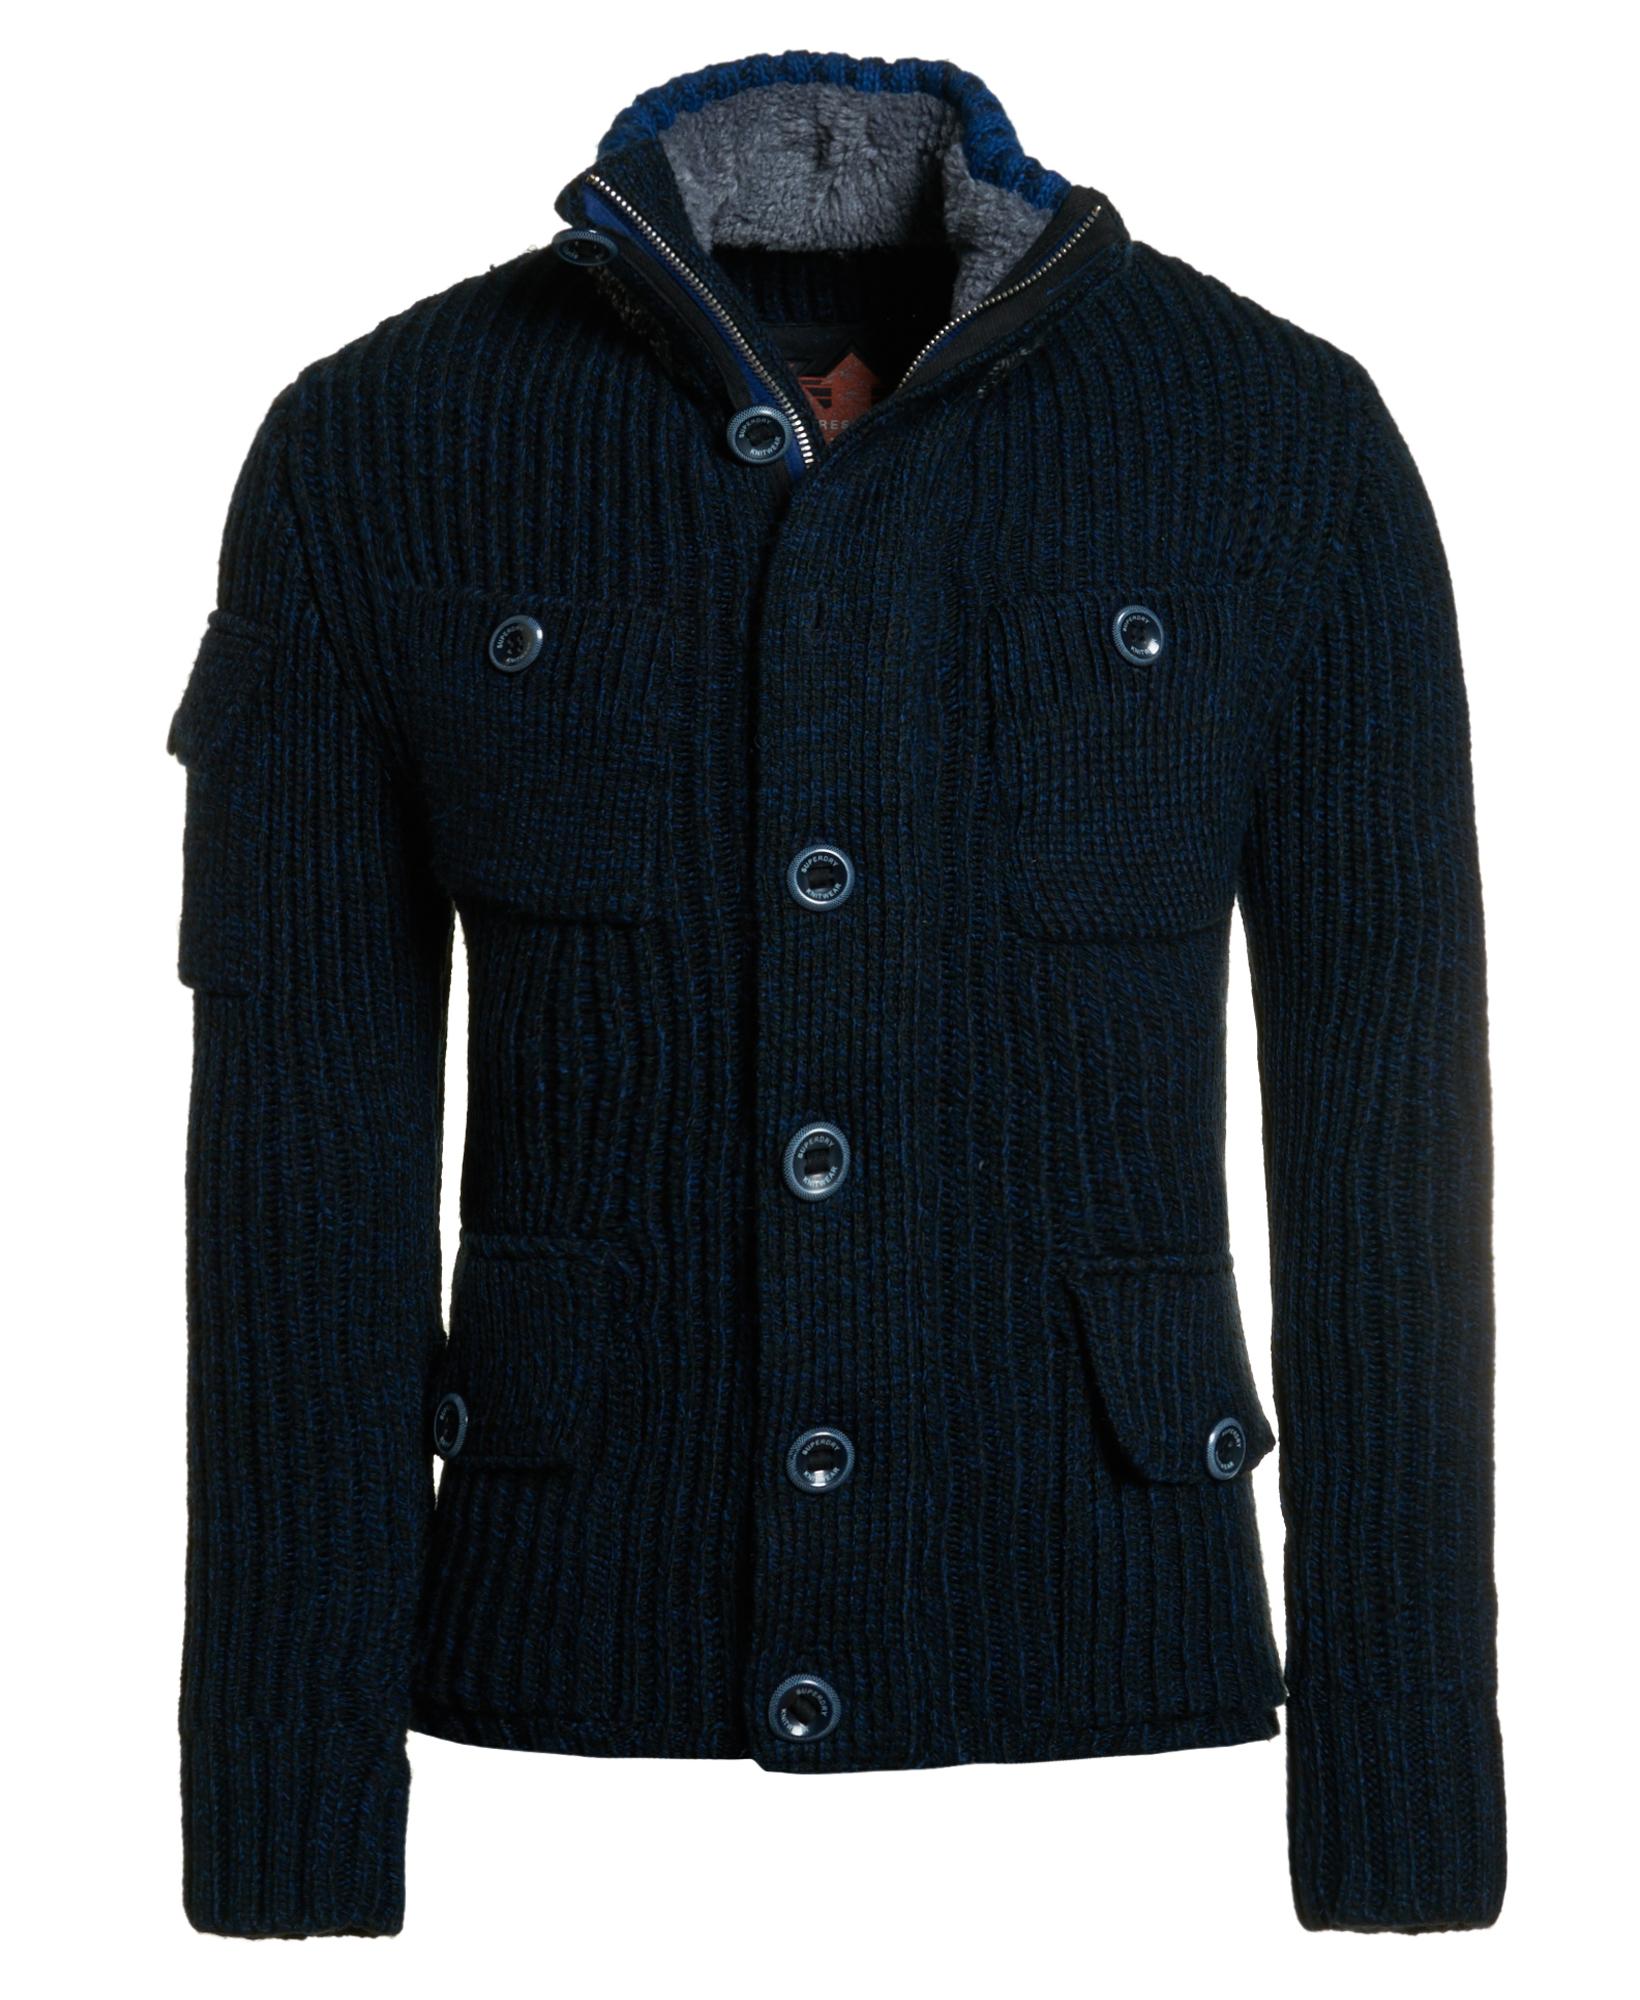 neuer herren superdry seaking 4 pocket field jacket seaking navy blend. Black Bedroom Furniture Sets. Home Design Ideas